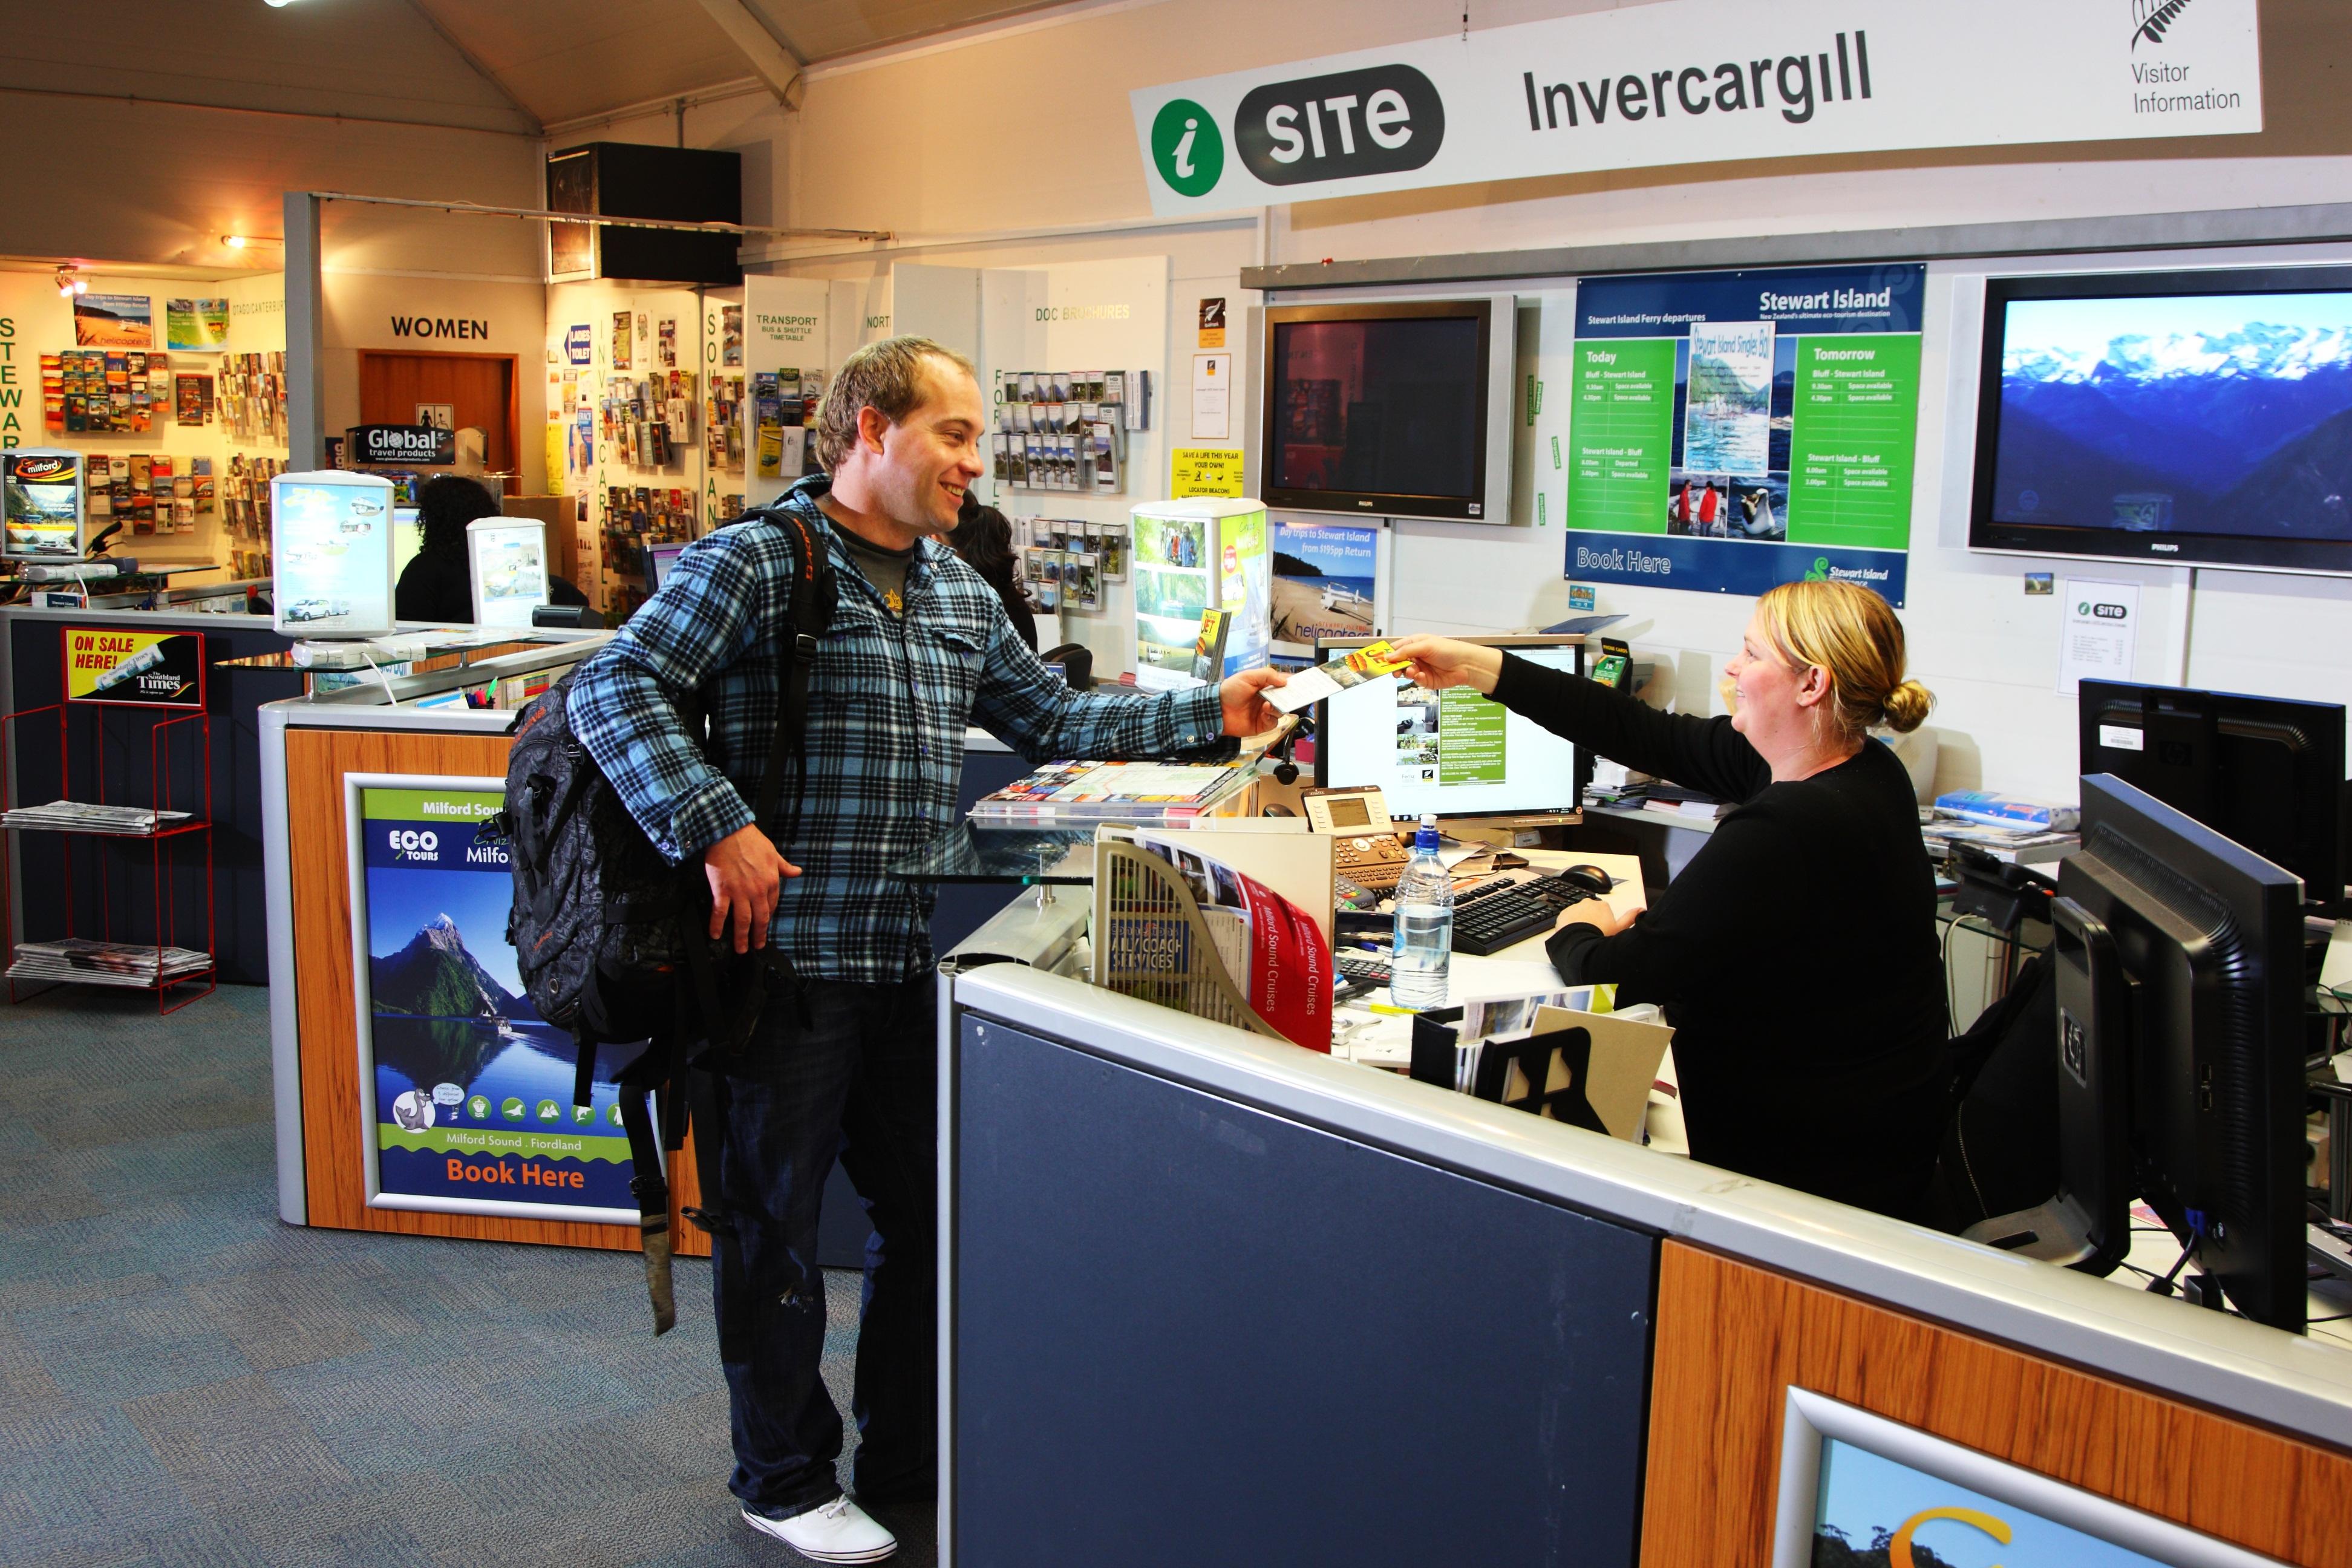 Invercargill i-SITE Visitor Information Centre